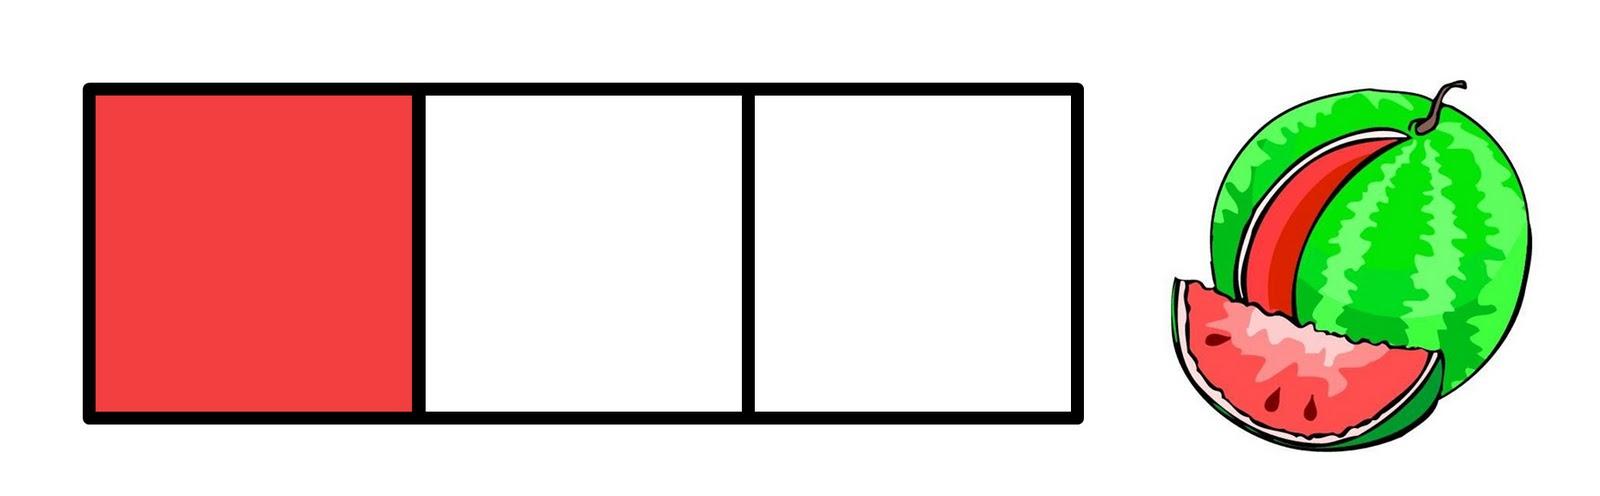 Начало середина конец слова схема фото 403